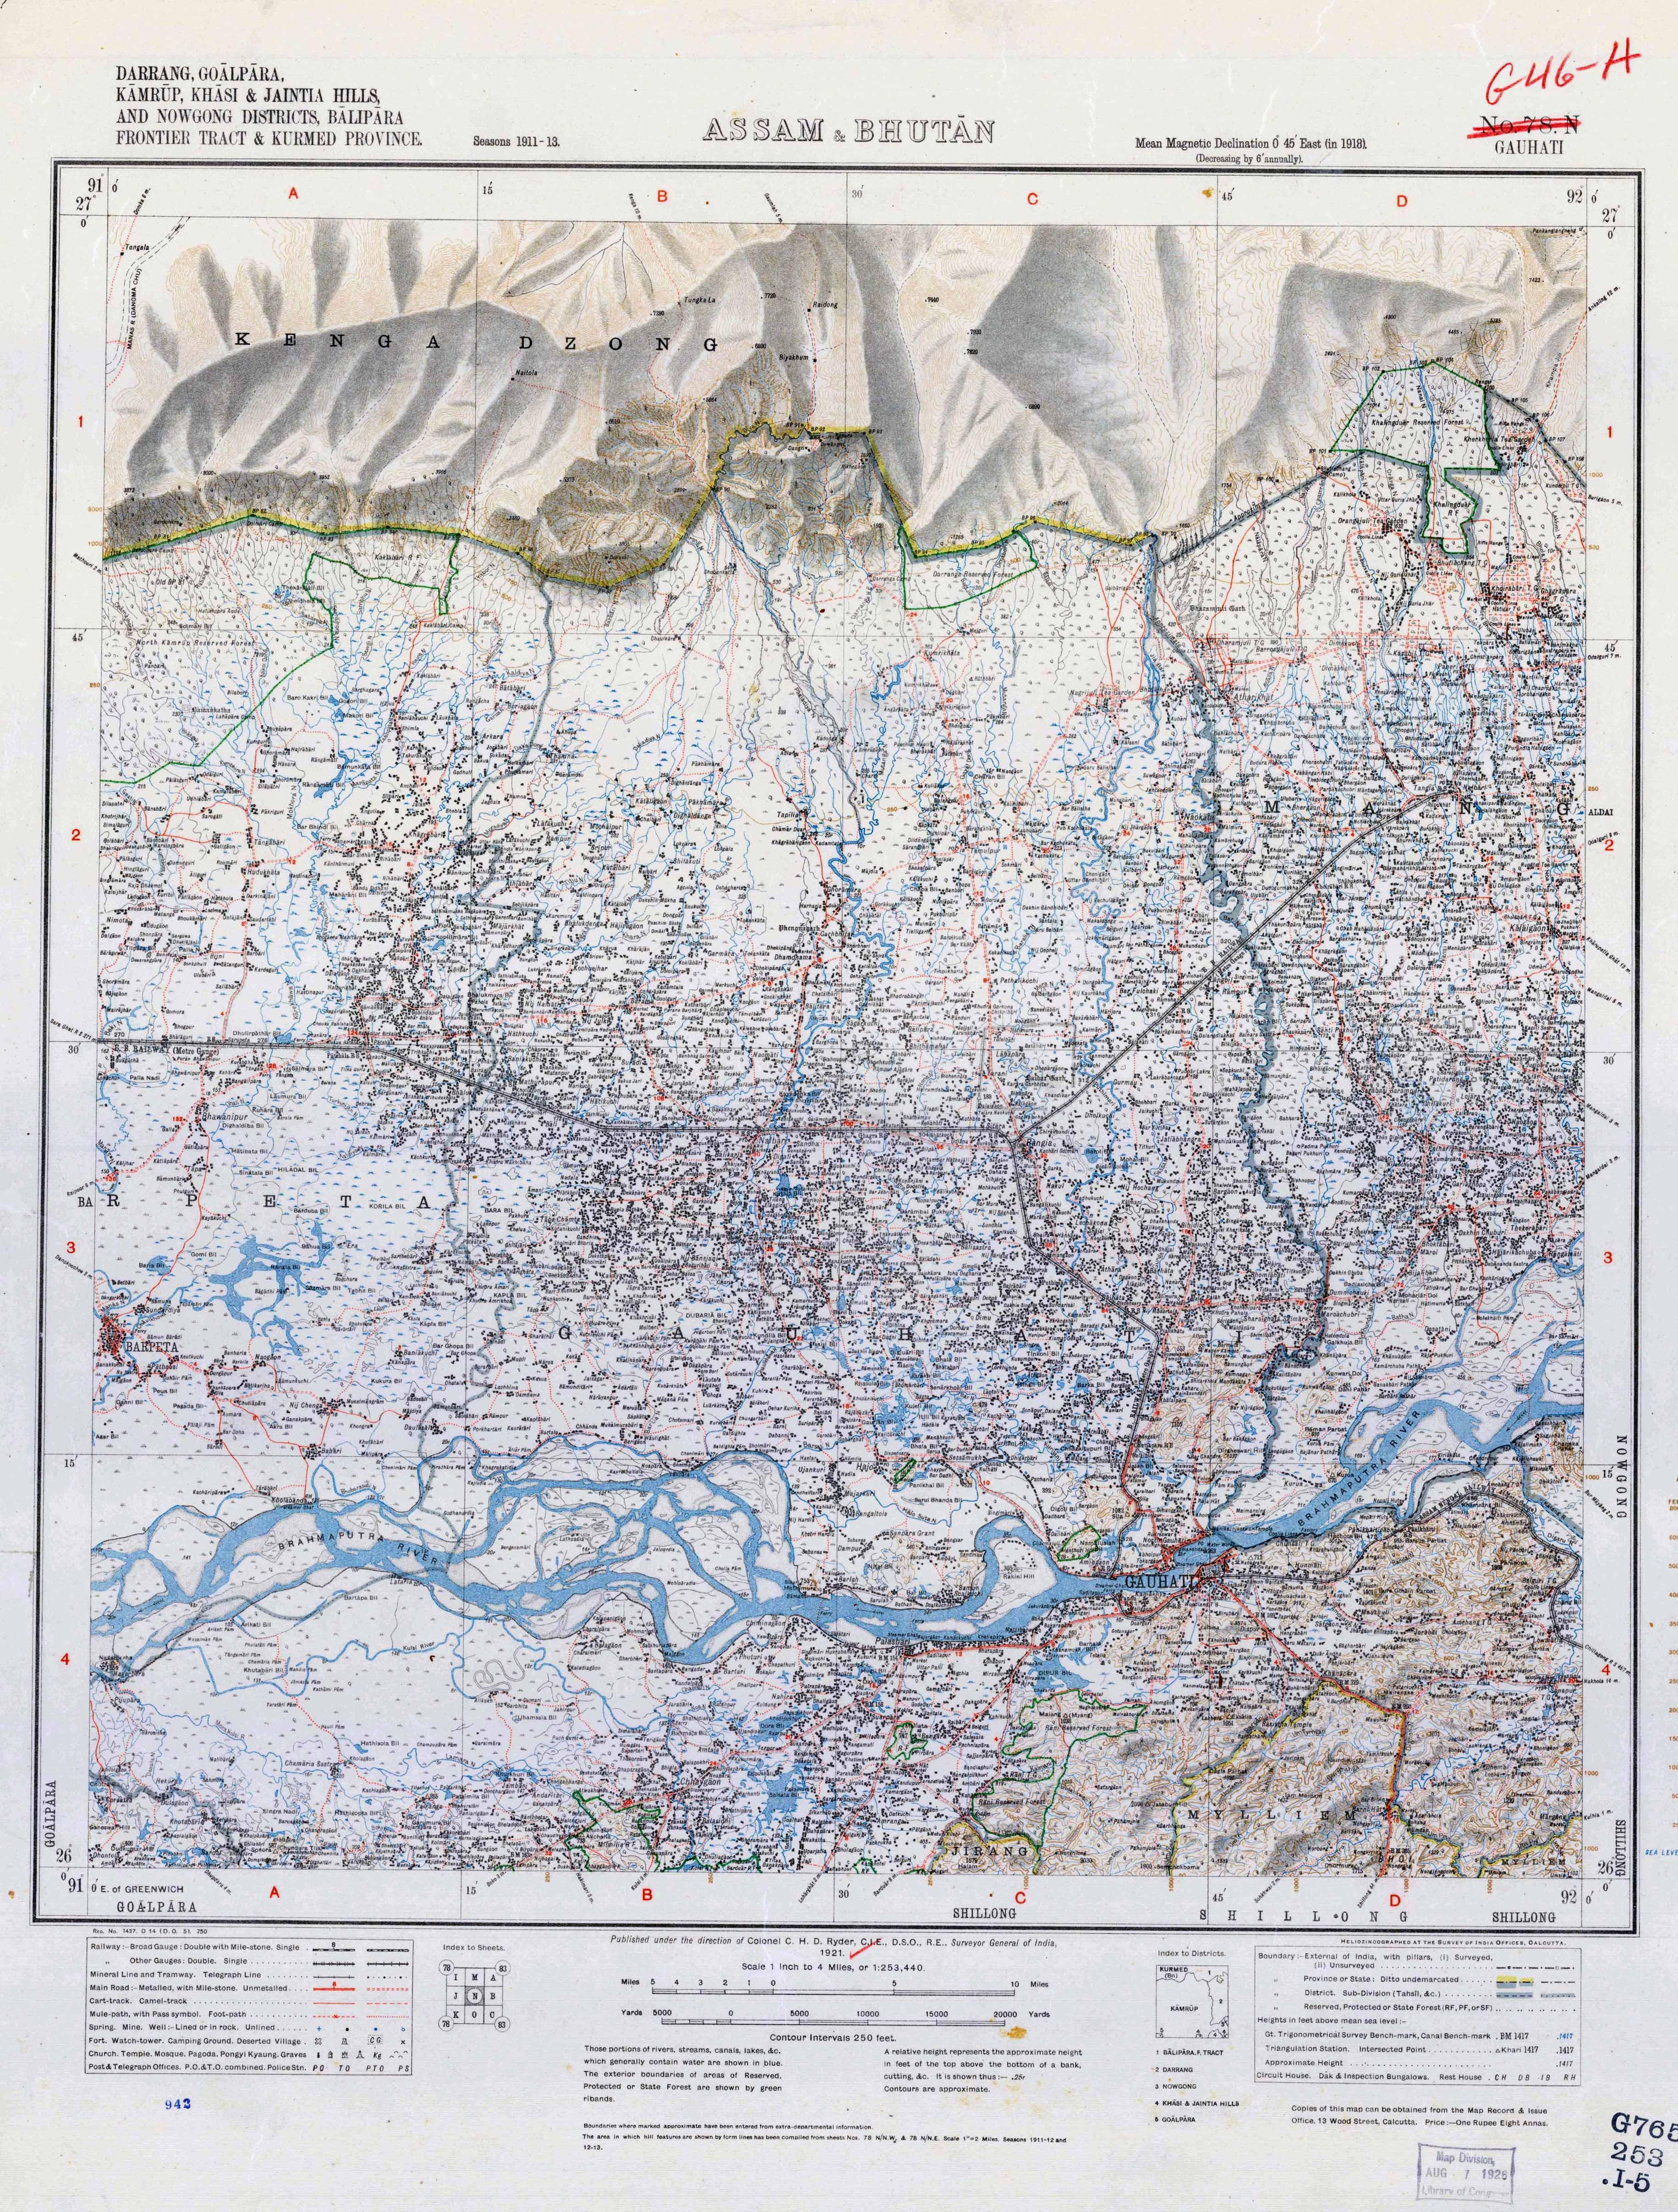 India Topographic Maps PerryCastañeda Map Collection UT - Georgia map 1921